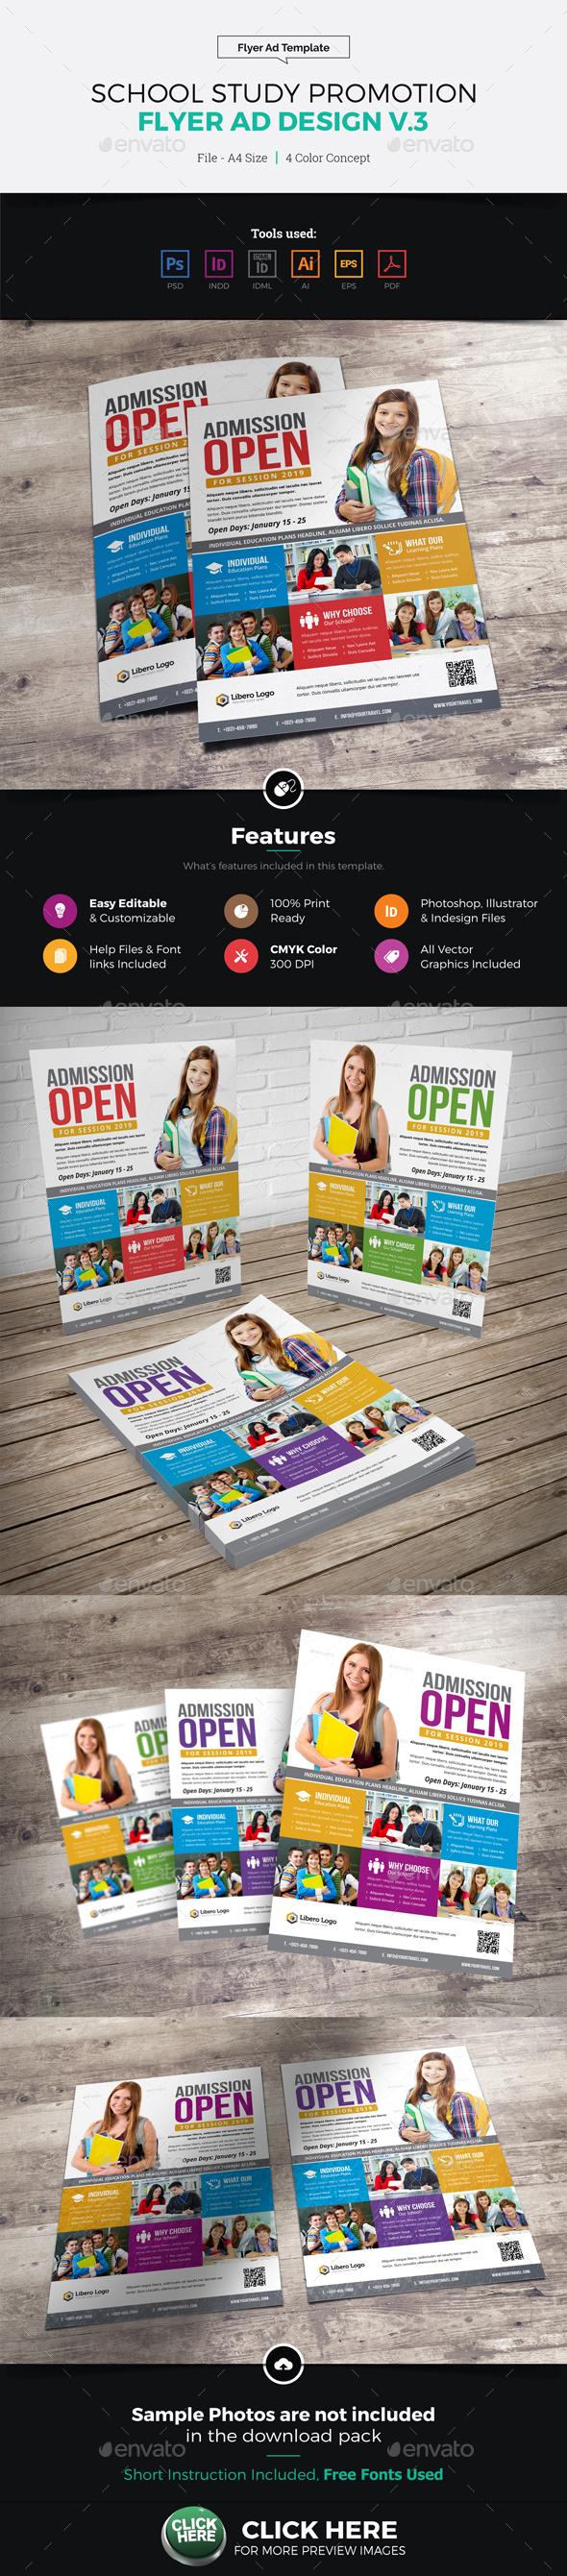 School Study Promotion Flyer Ad v3 - Corporate Flyers